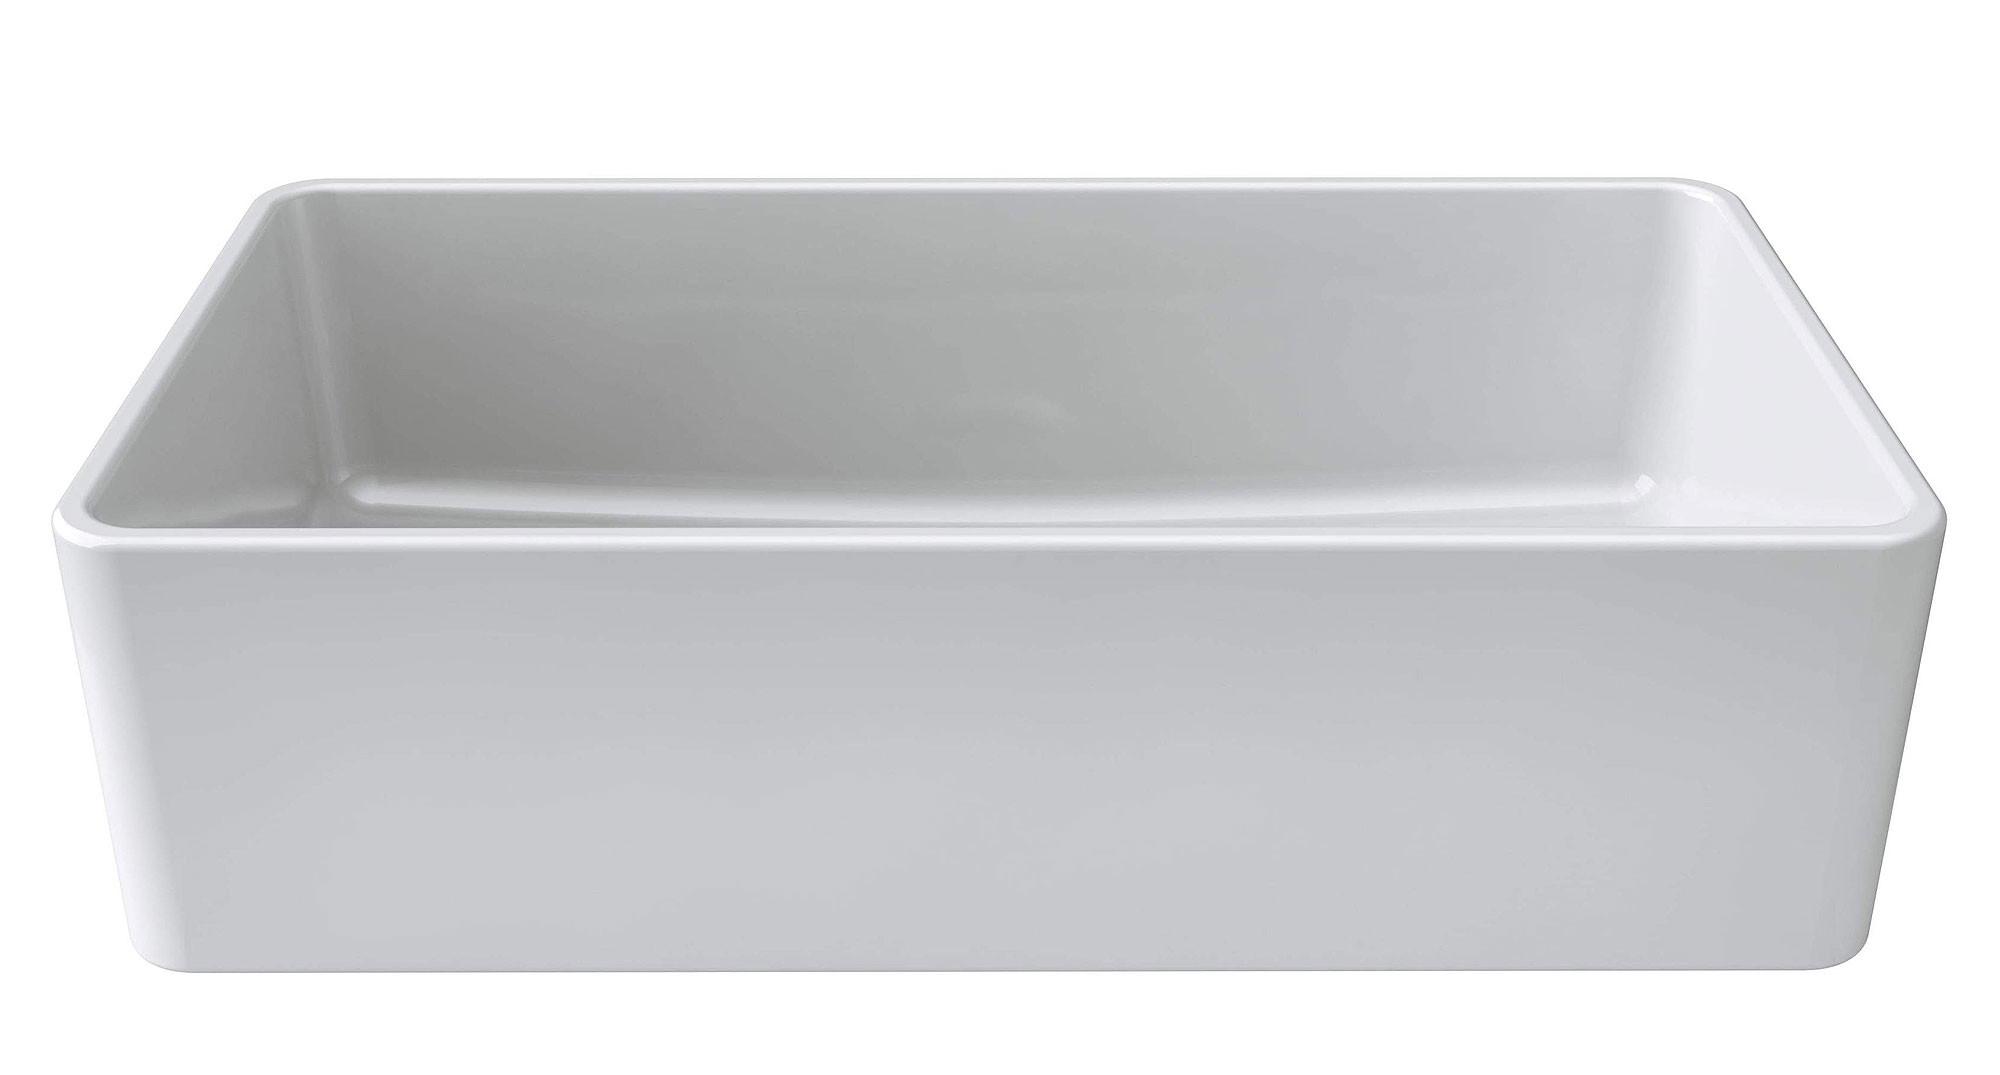 Latoscana LTW3619W Rectangular Reversible Farmhouse Kitchen Sink In White